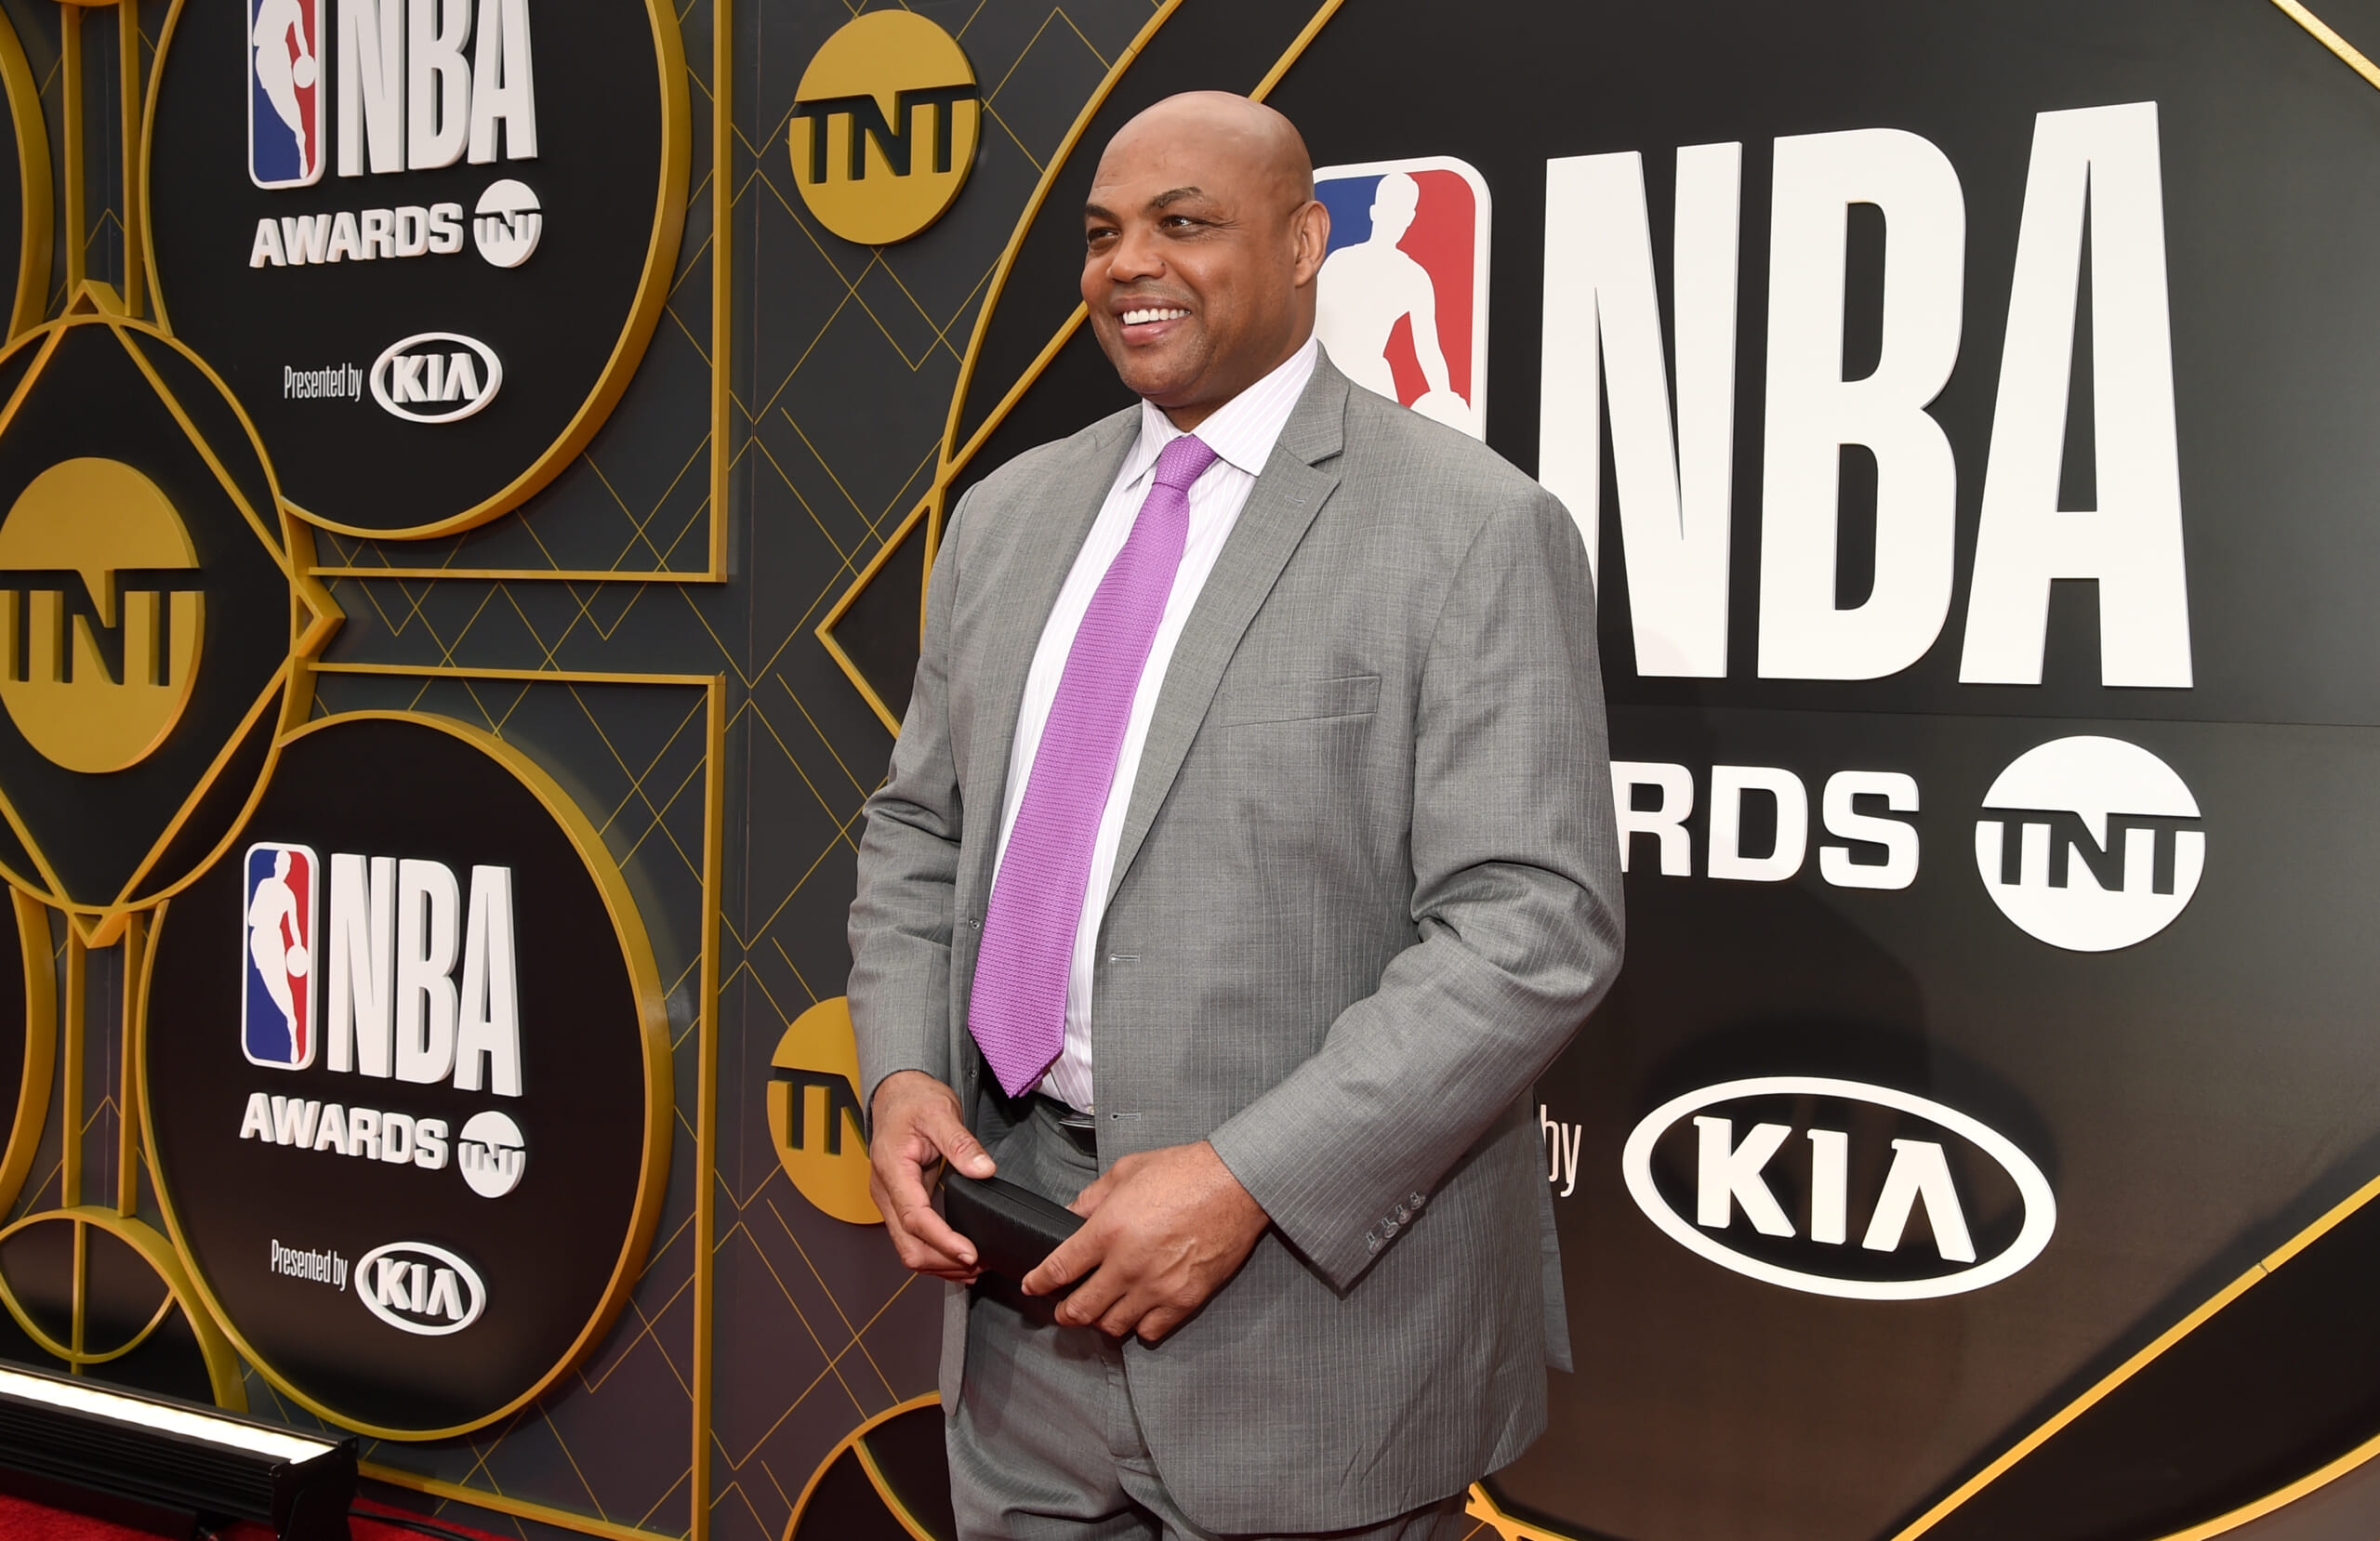 Charles Barkley at the TNT NBA Awards